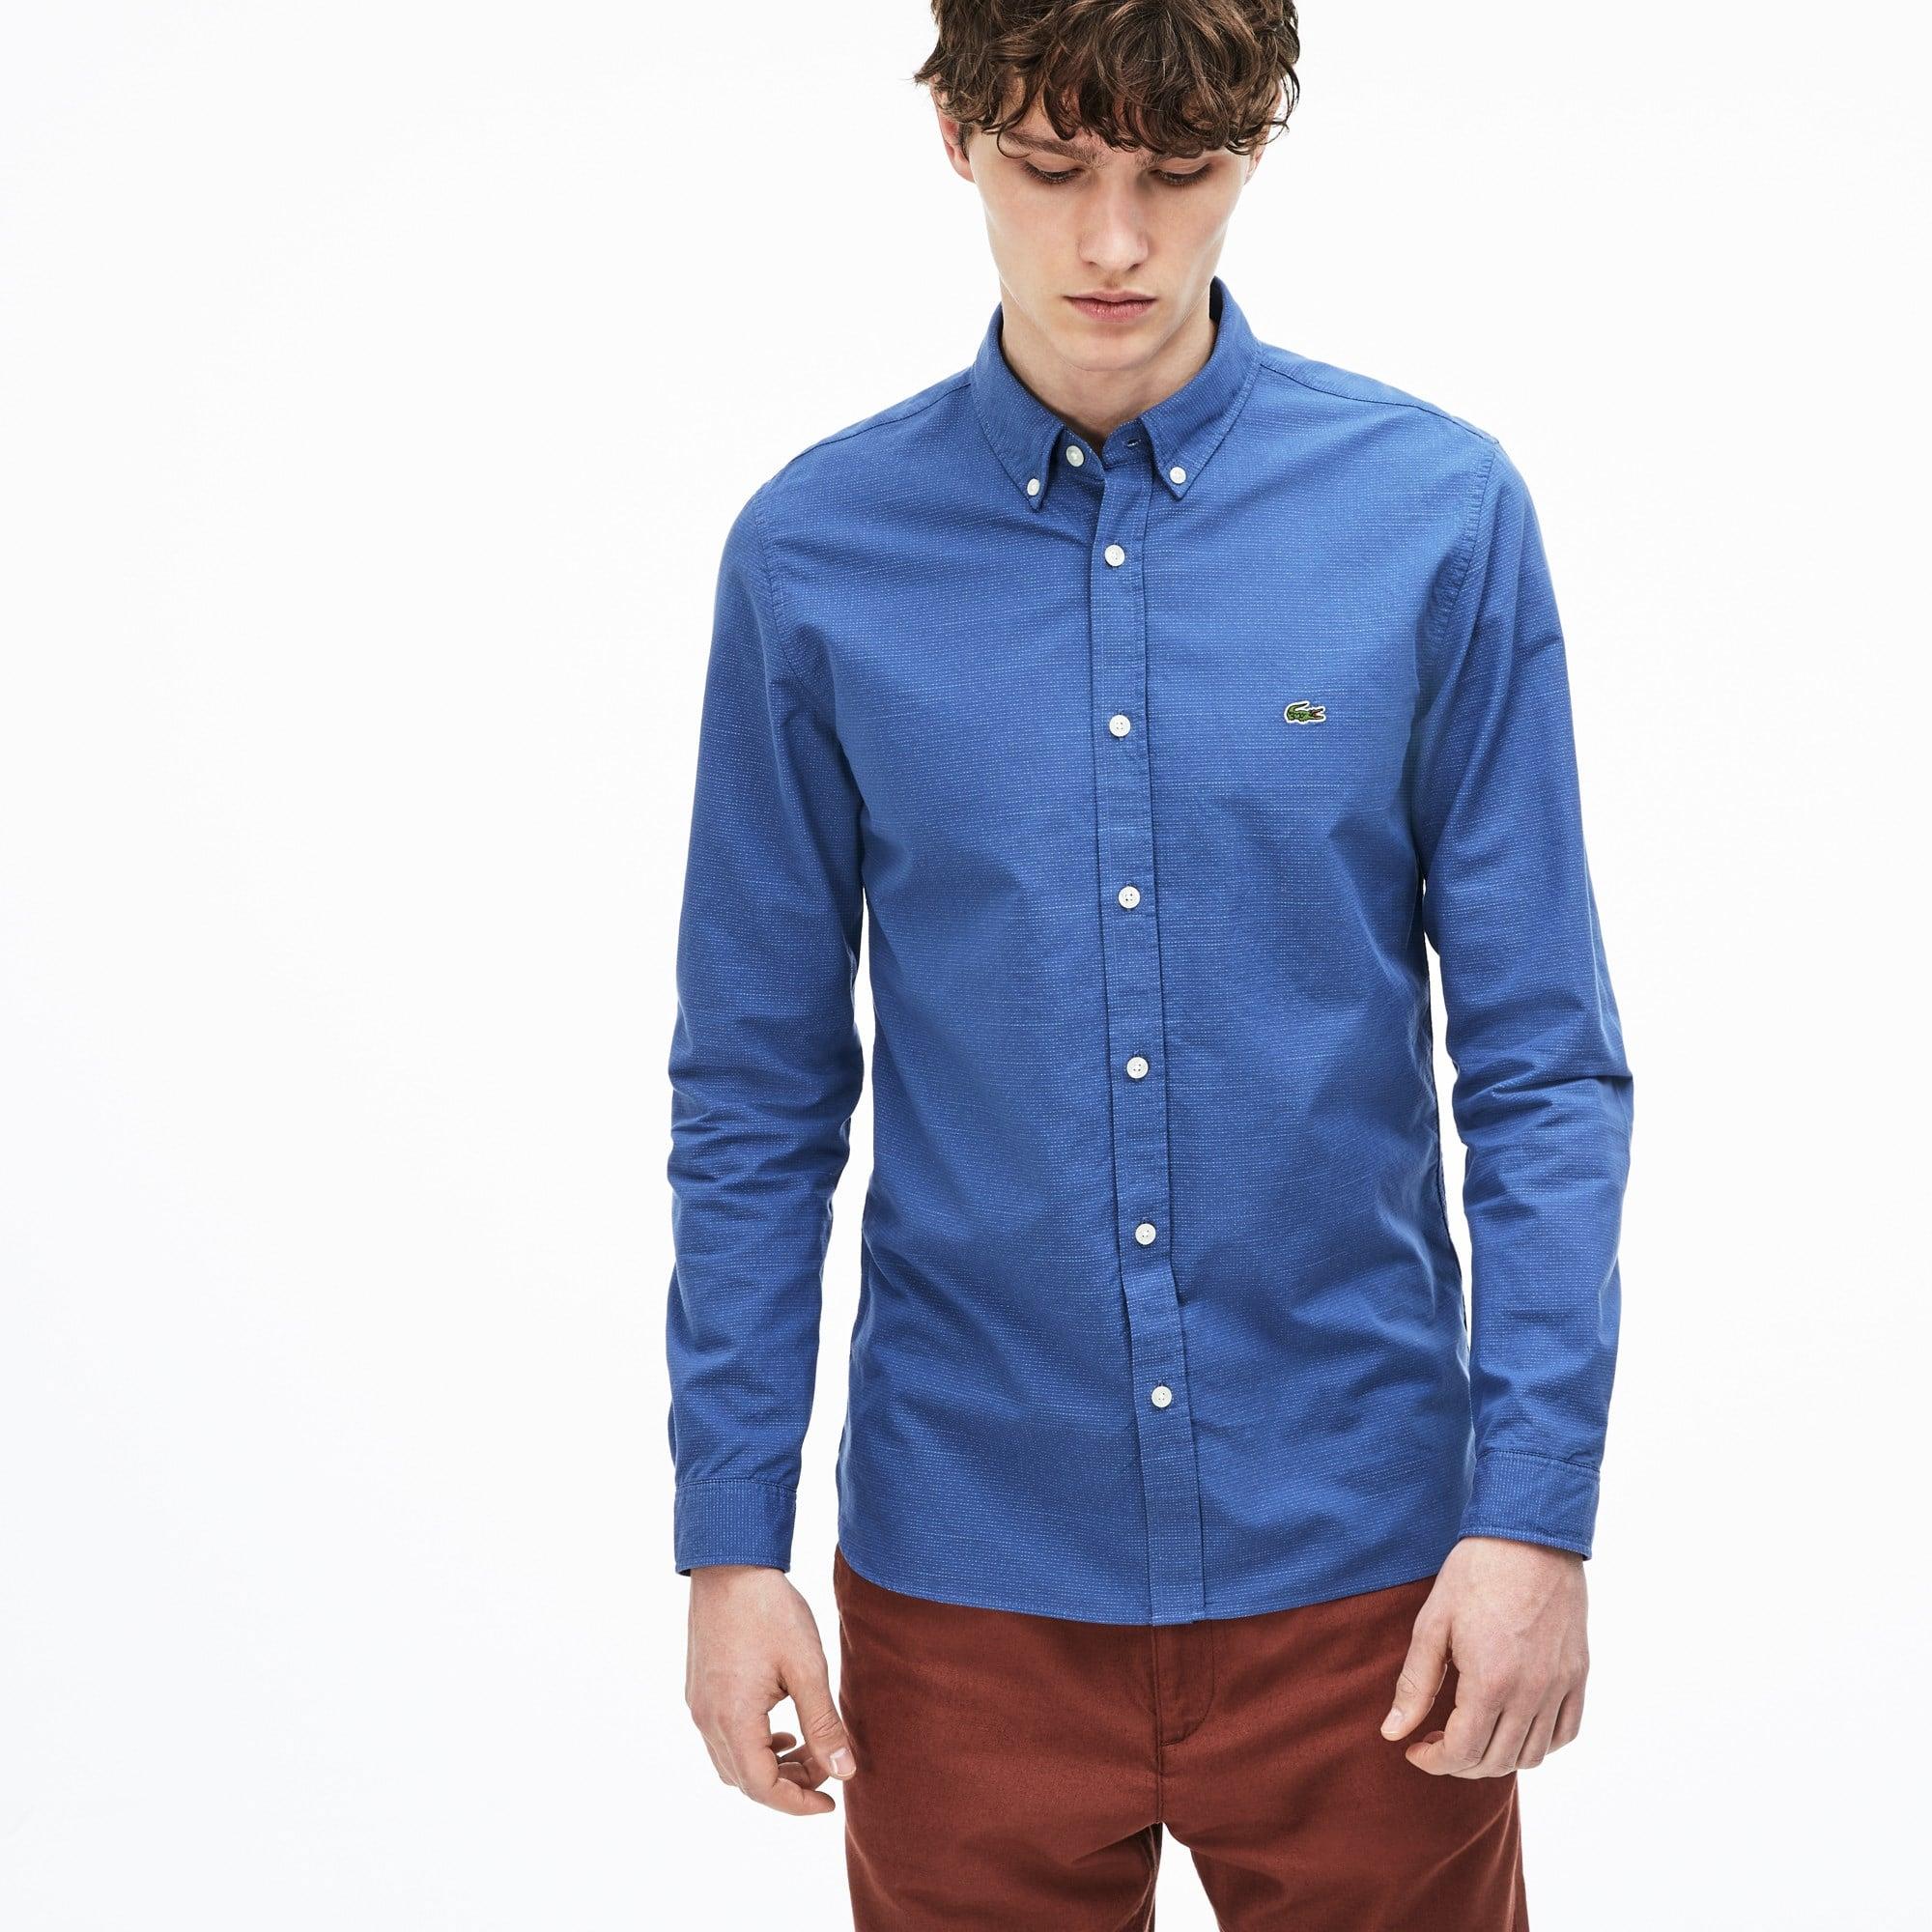 Men's Slim Fit Polka Dot Jacquard Cotton Poplin Shirt